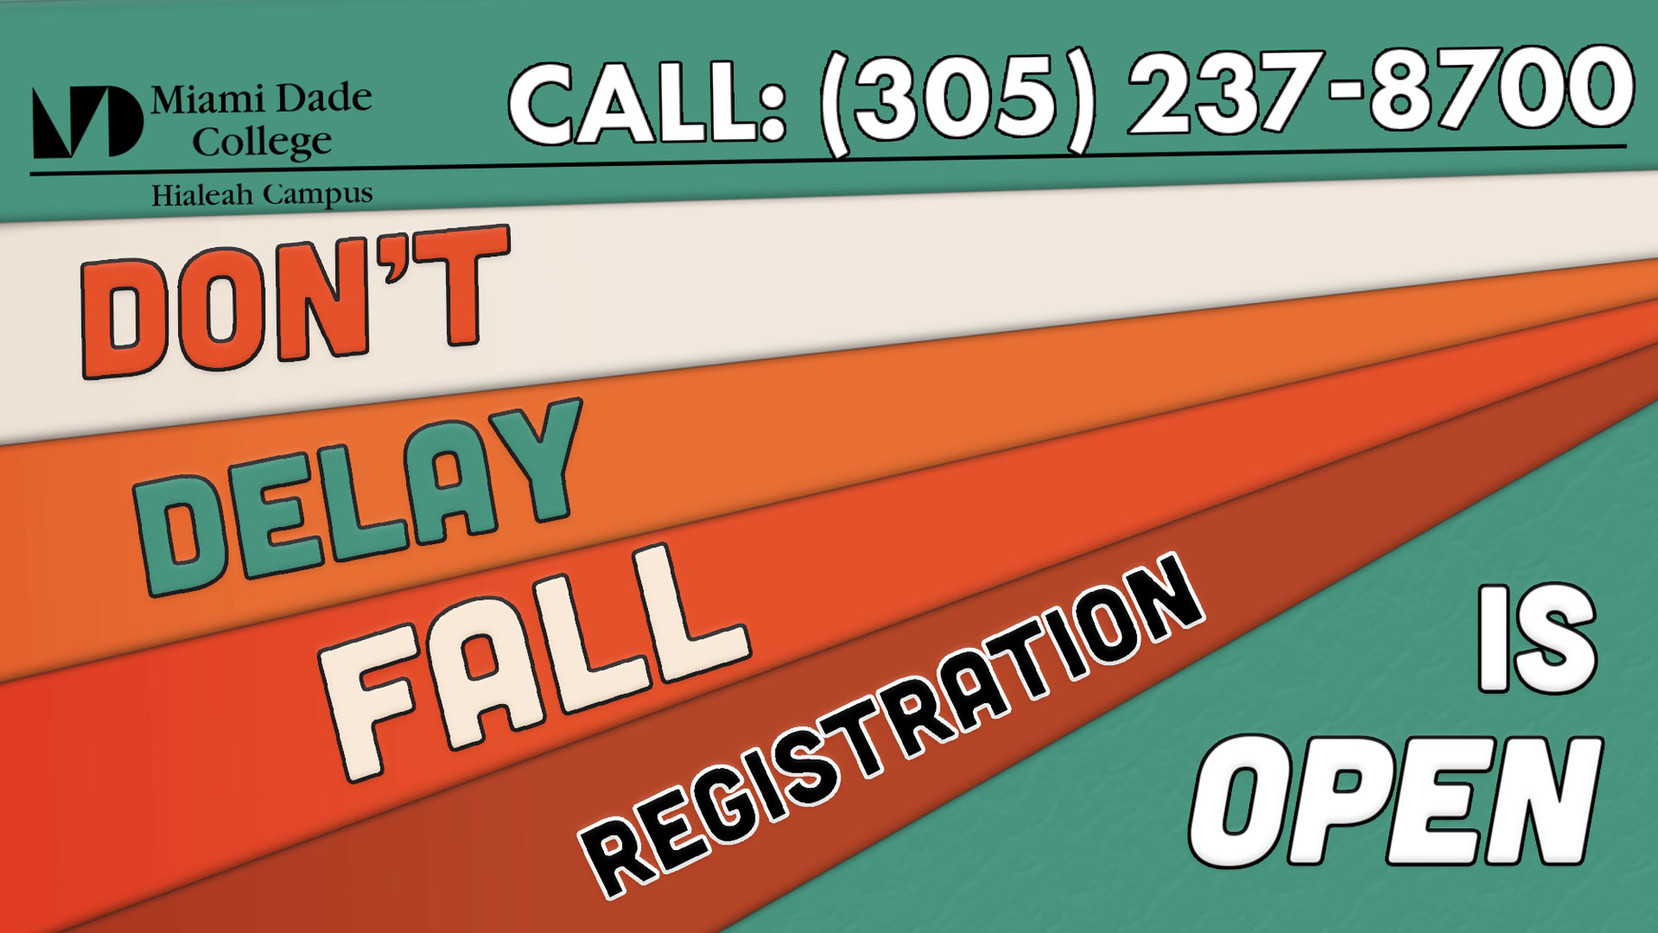 Don't delay fall registration is open -